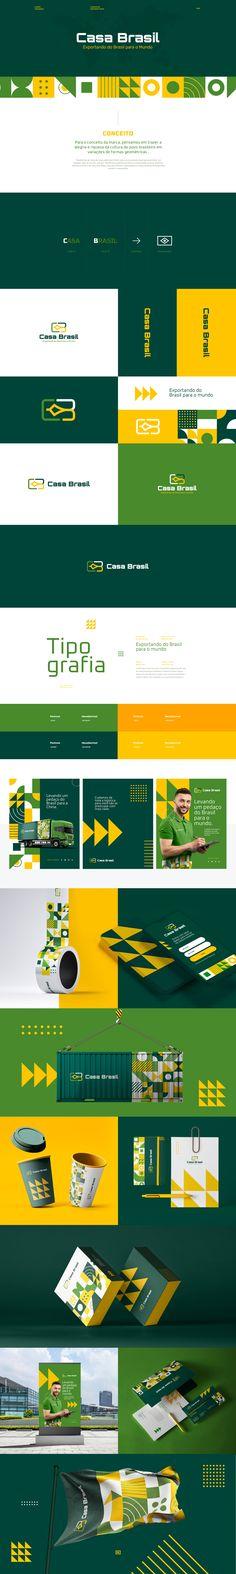 Corporate Style, Corporate Branding, Corporate Design, Logo Branding, Logos, Identity Design, Visual Identity, Brand Identity, Media Design